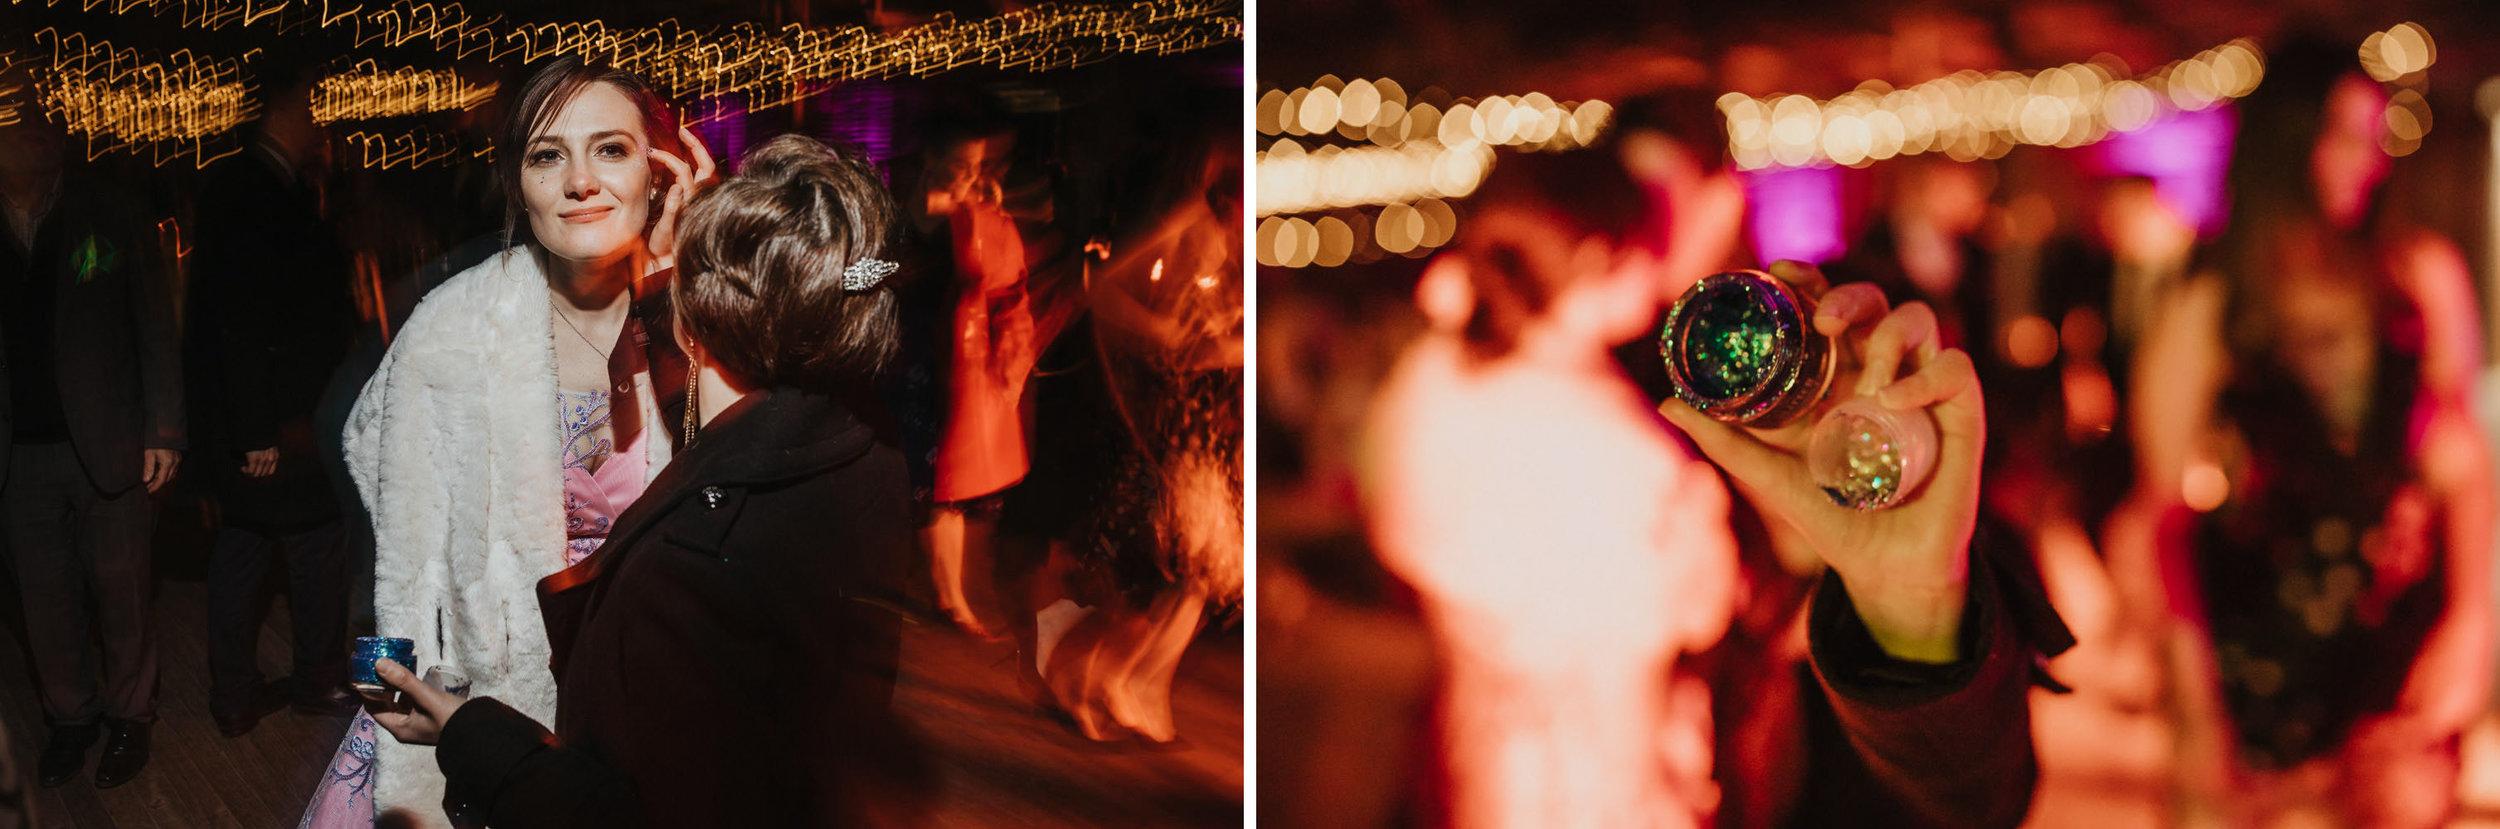 alternative-wedding-australia-non-traditional_153.jpg